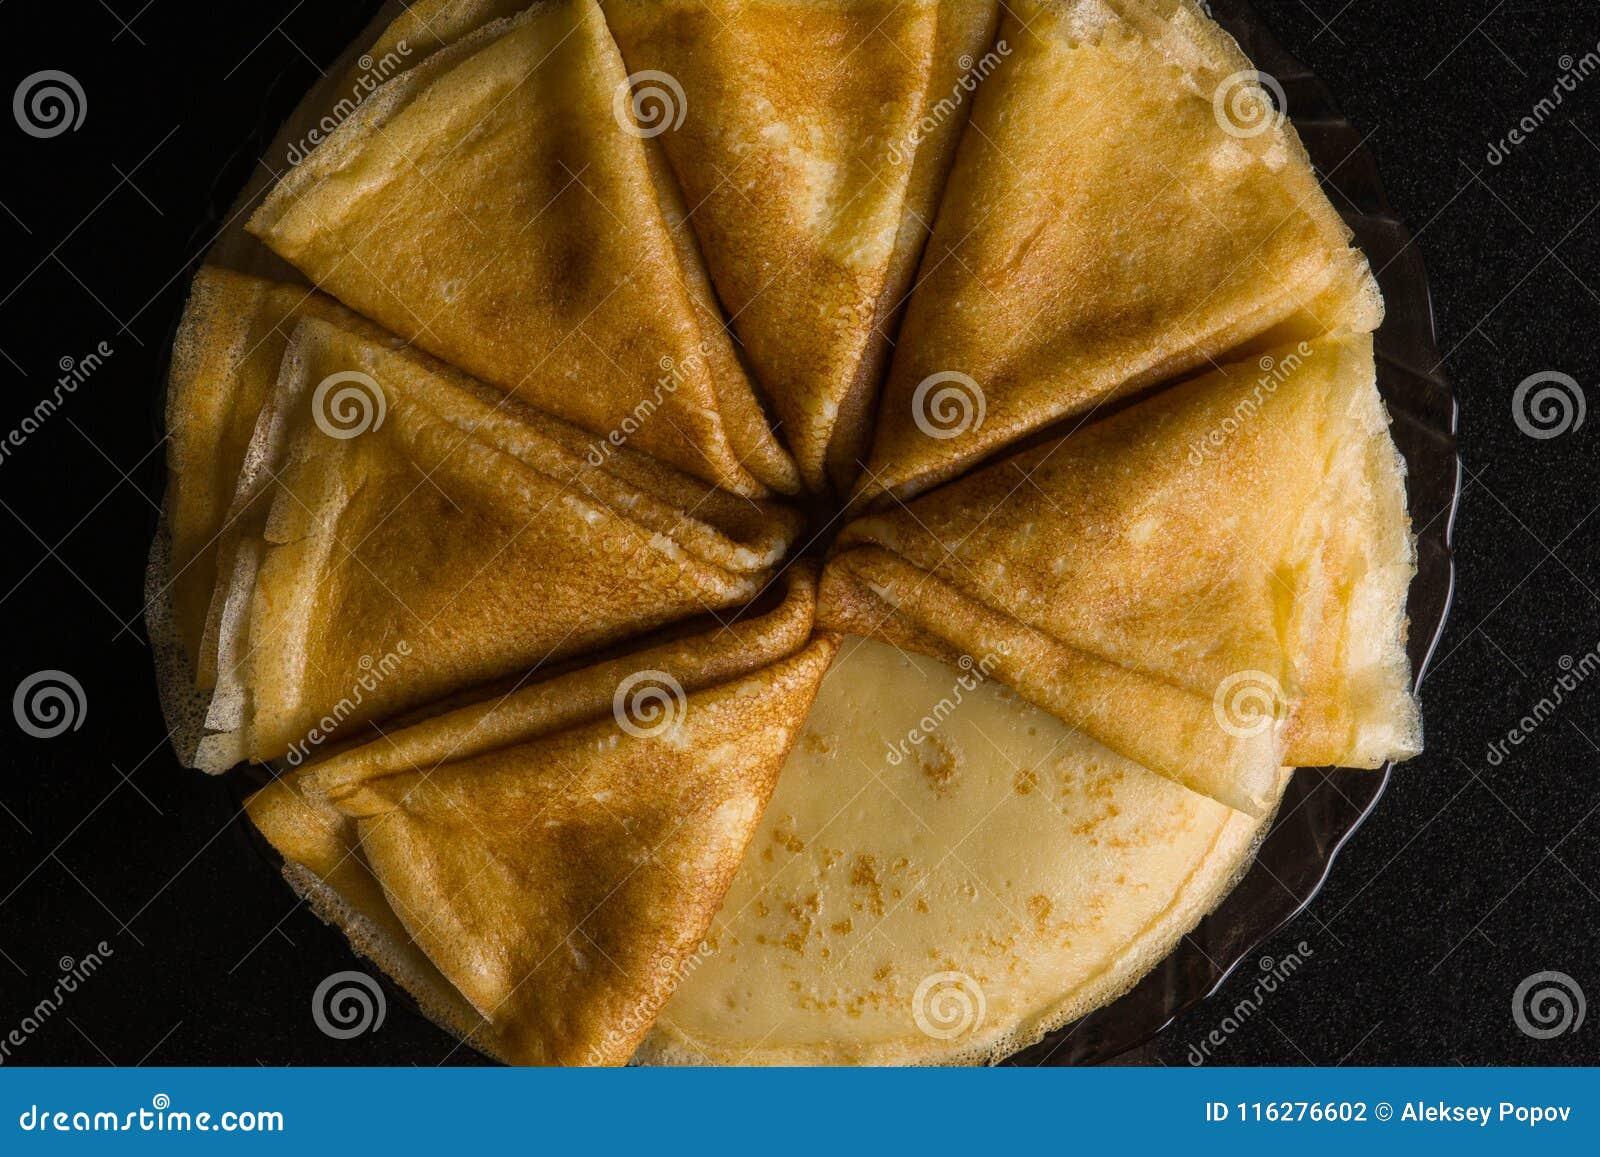 Pannkakor pannkakor gör tunnare Bliny ryss maslenitsa blini, frukost, kräpp, honung, bakelse, bunt, pannkaka, ryss, bakgrund, c